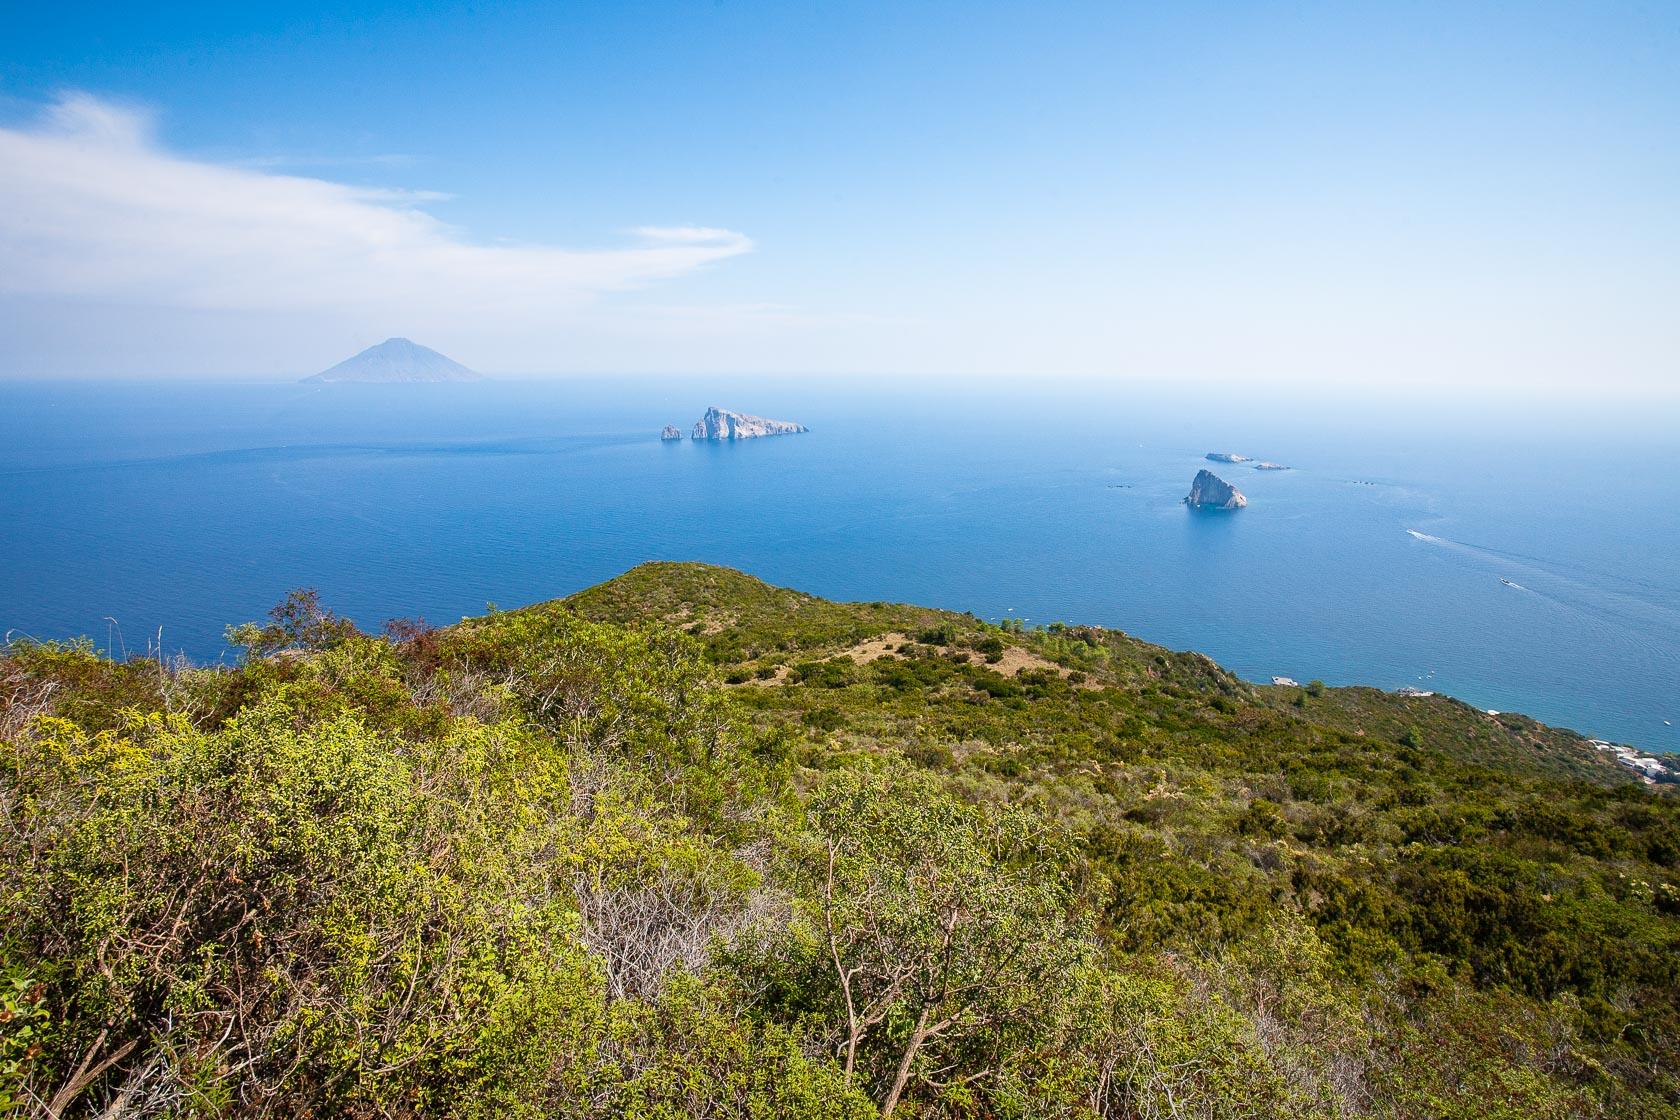 Le volcan Stromboli vu depuis l'île de Panarea